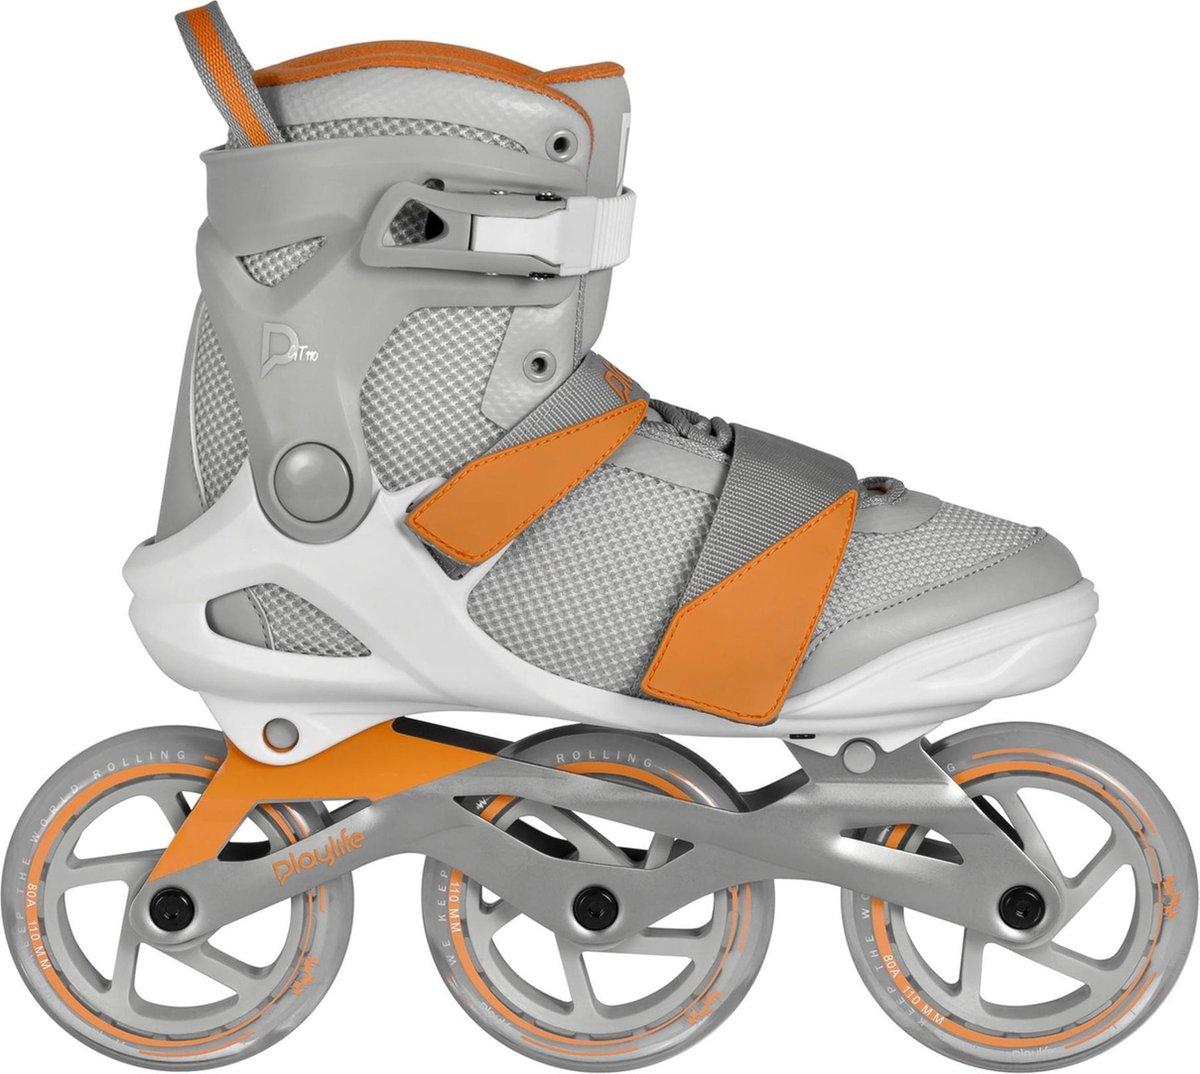 Playlife Inlineskates - Maat 37 - Unisex - grijs,oranje,wit